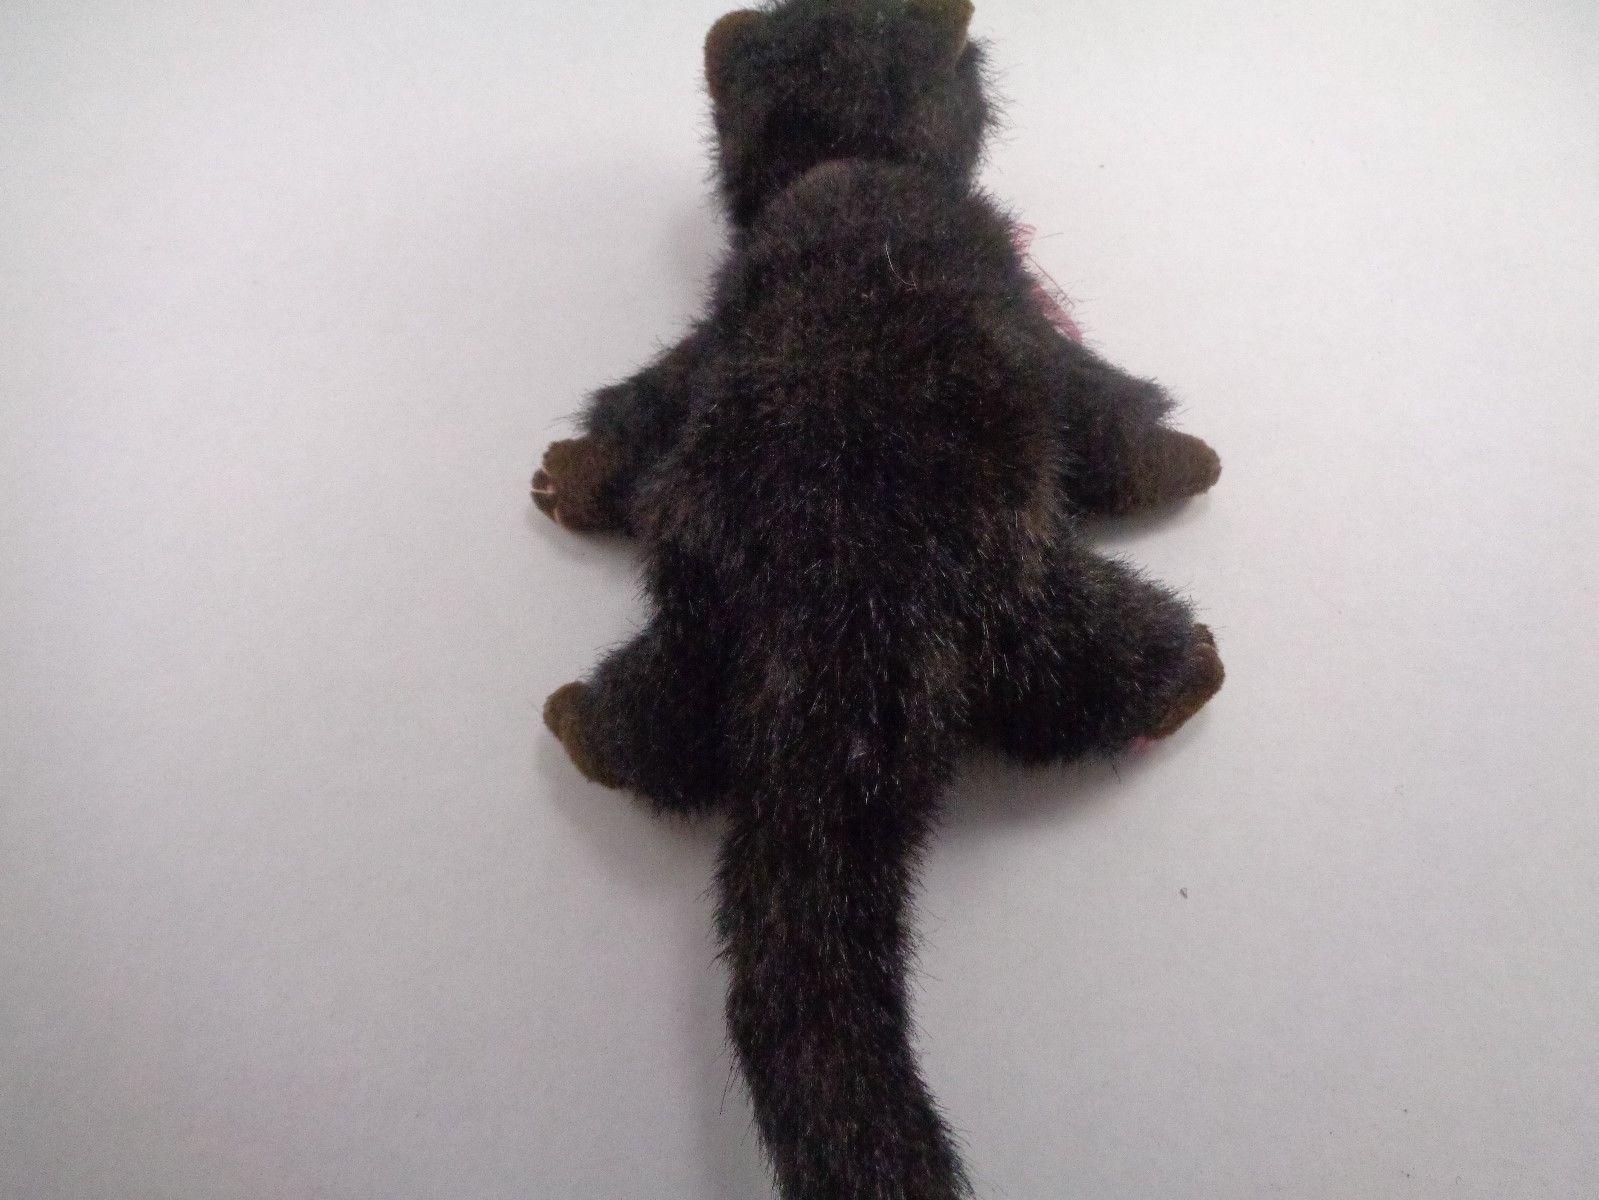 Halloween Ty Black Cat Heiress Pink Bow Plush Stuffed Animal Toy Doll image 7